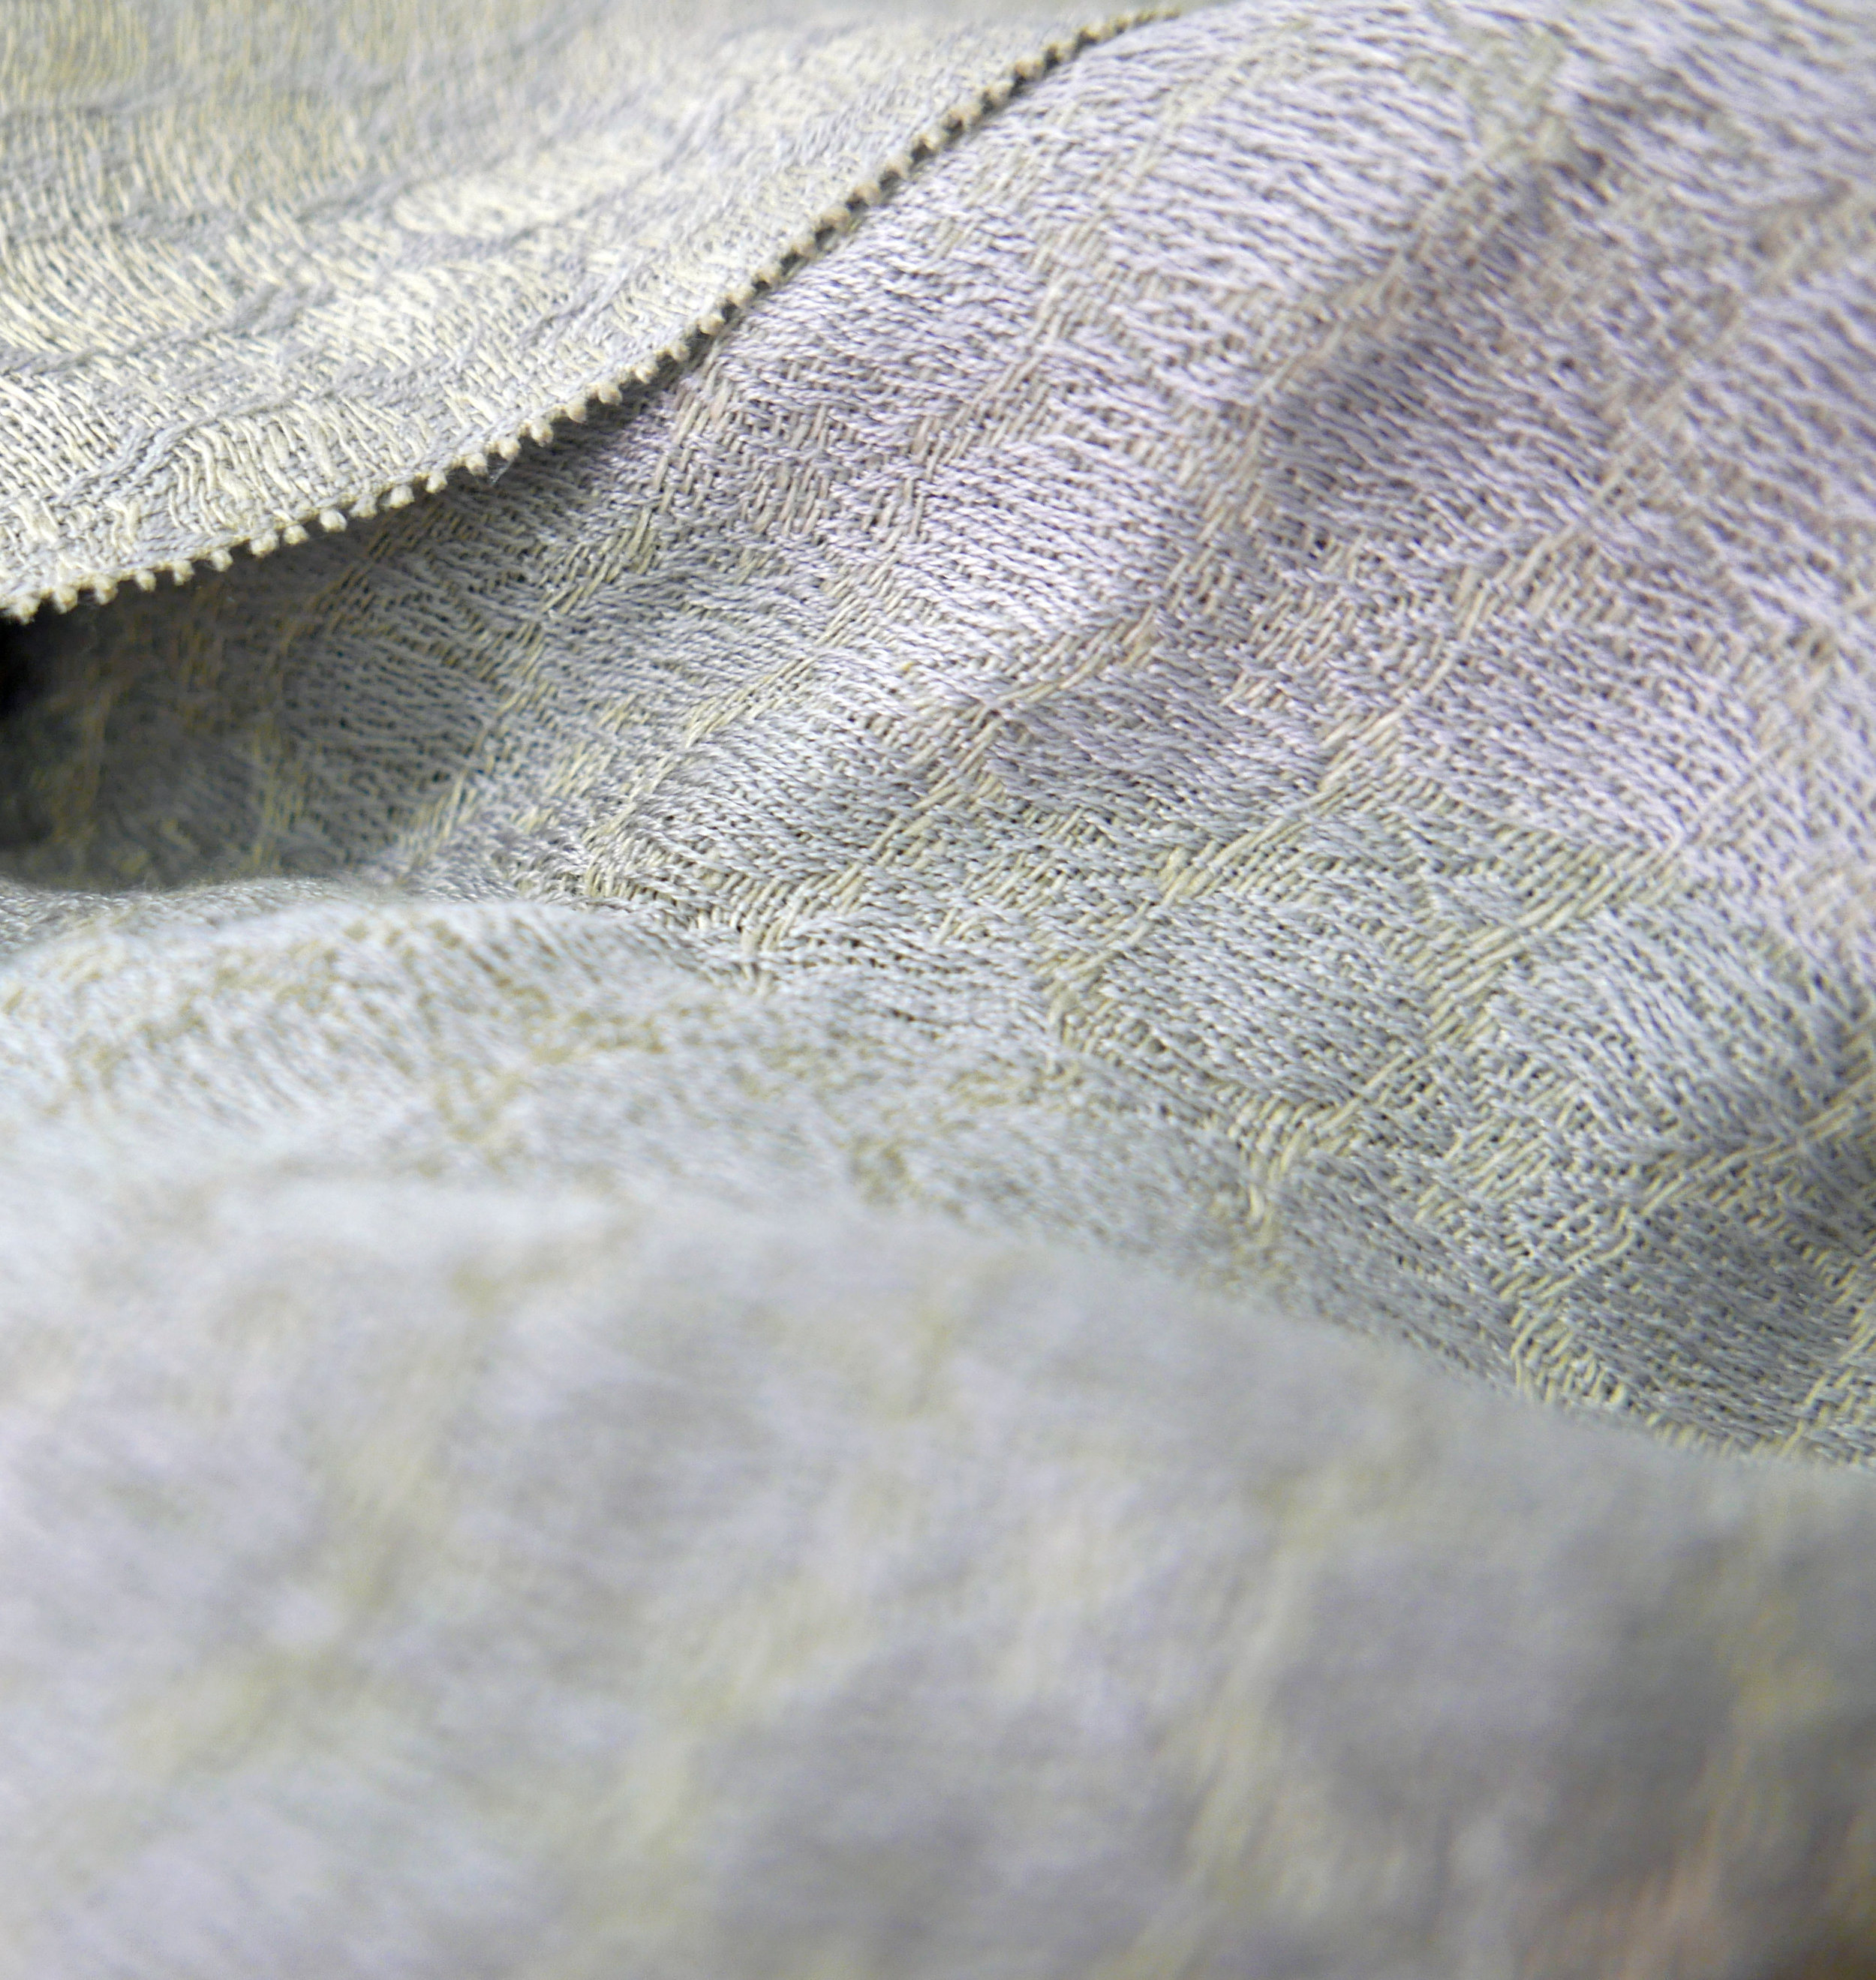 SilverShore_BrendanJoseph_silver_grey_gray_LinenandSilk_scarf.jpeg